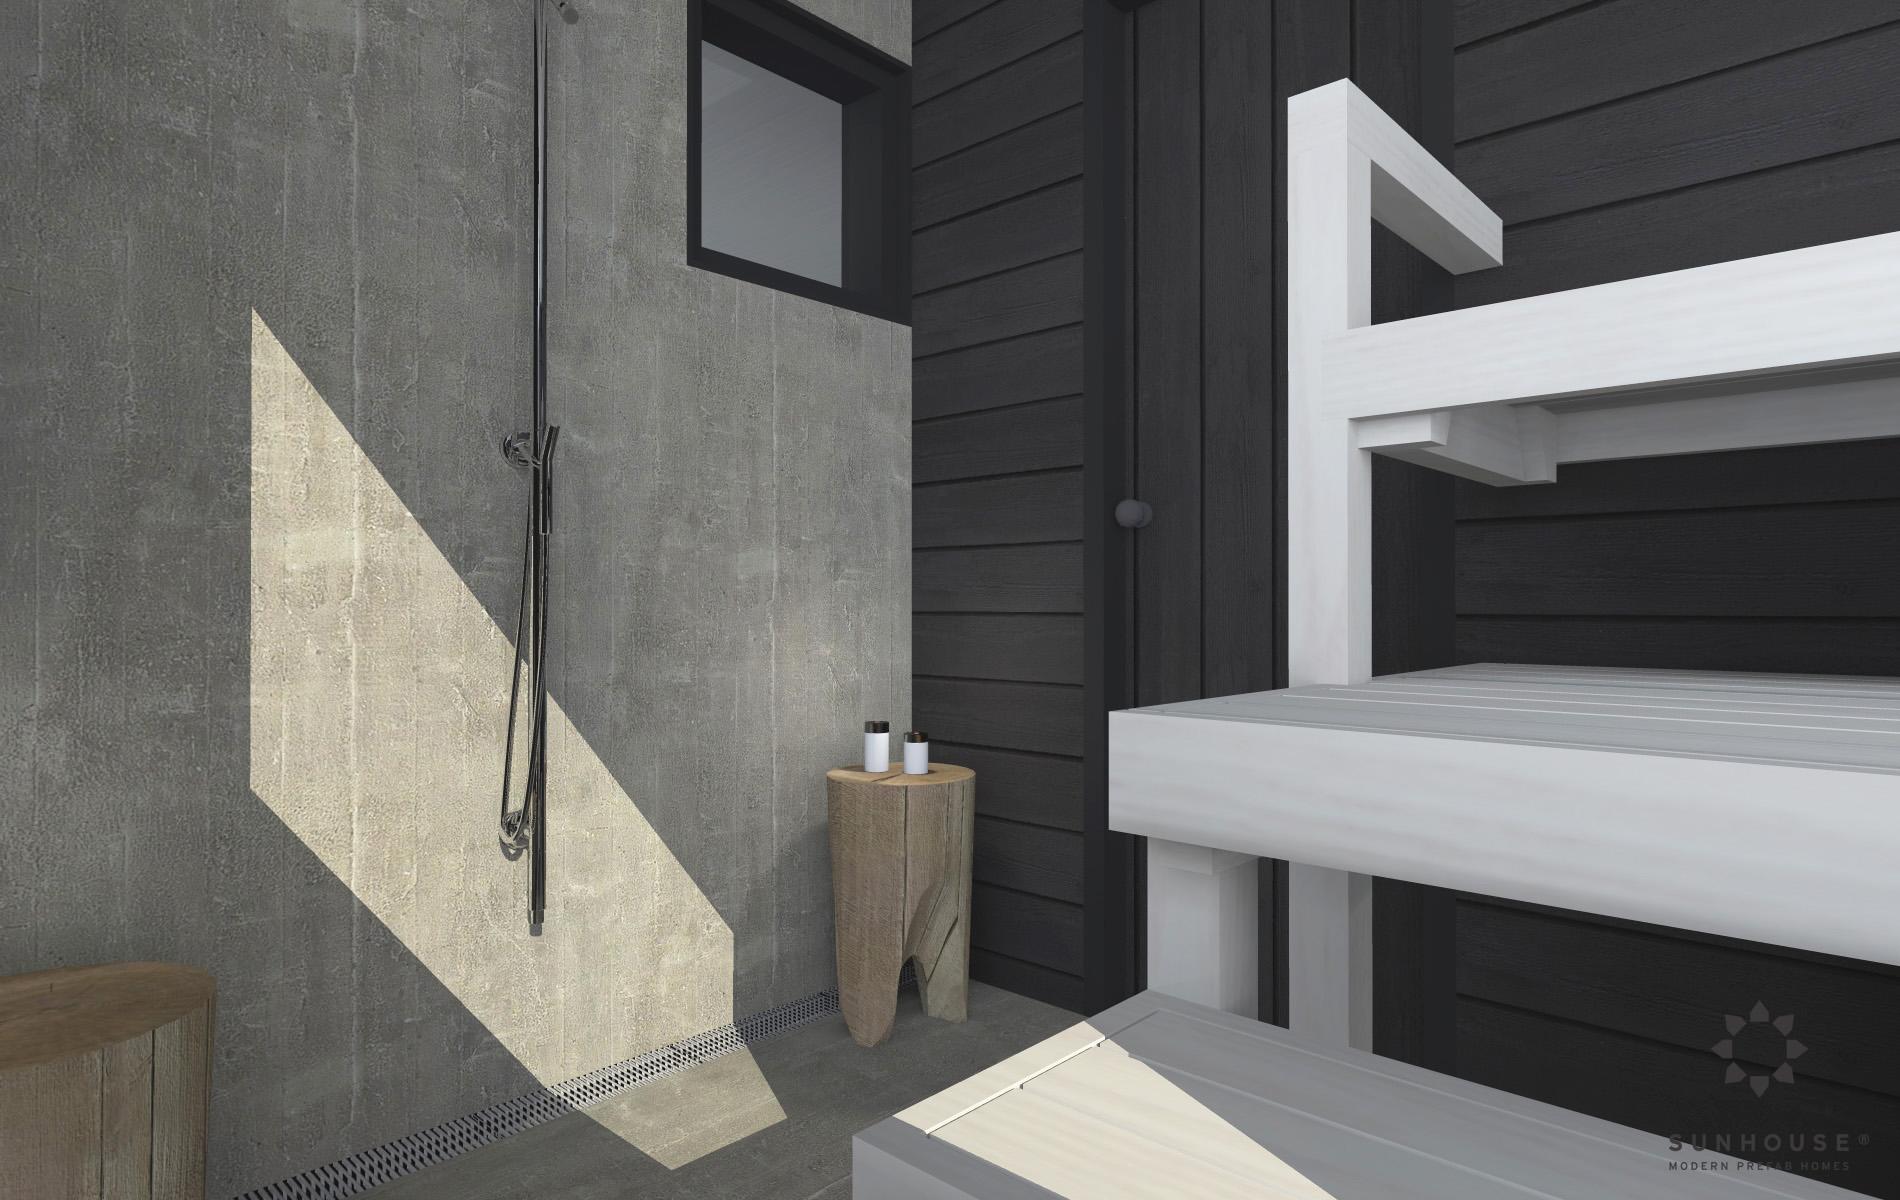 Moderni arkkitehdin sauna S1516 (7).jpg